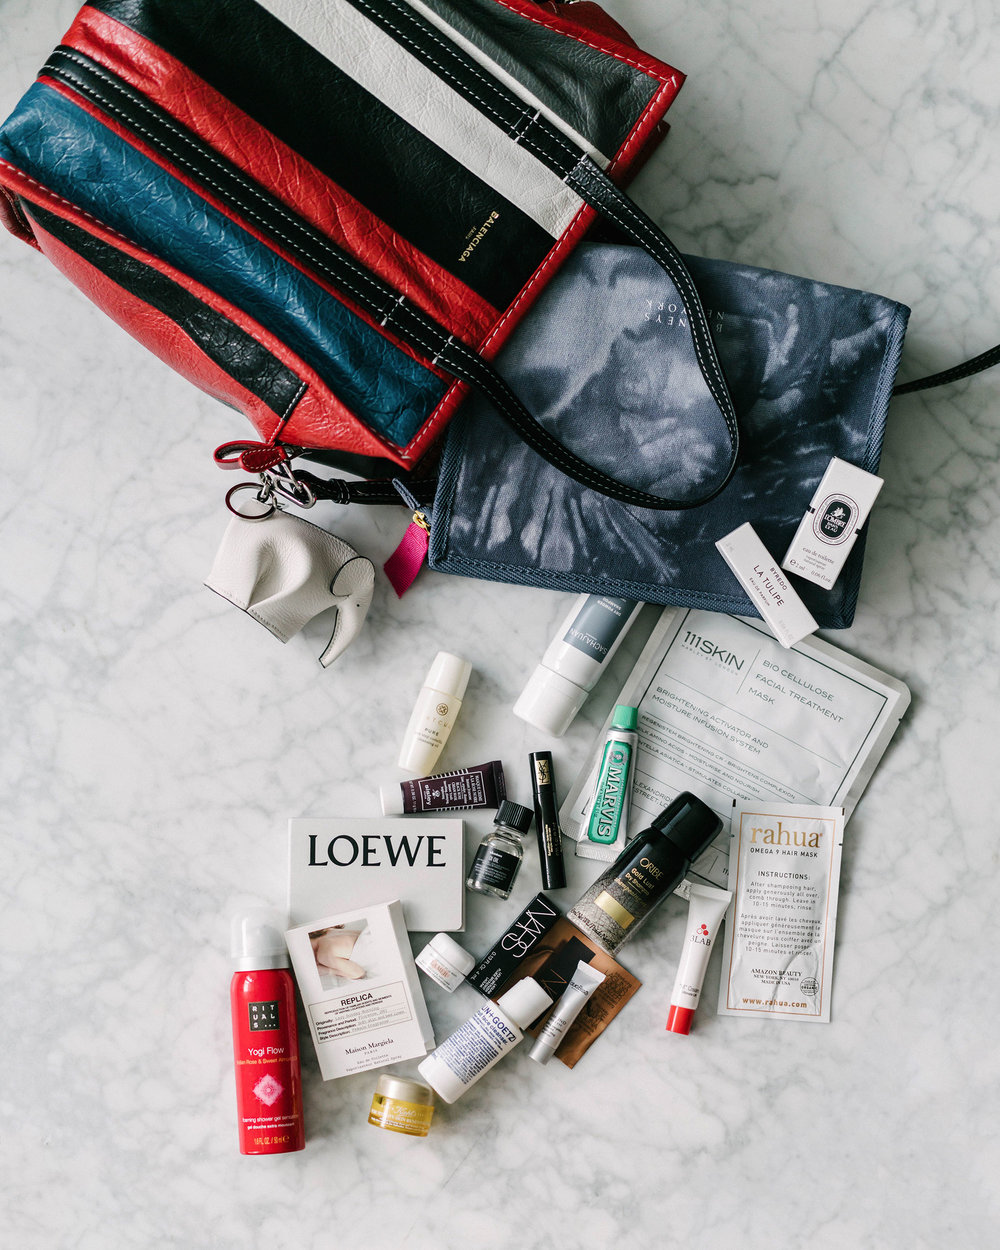 Balenciaga Bag, Loewe Keychain, Barneys New York Love Yourself Beauty Bag (ends tomorrow, March 11th!)